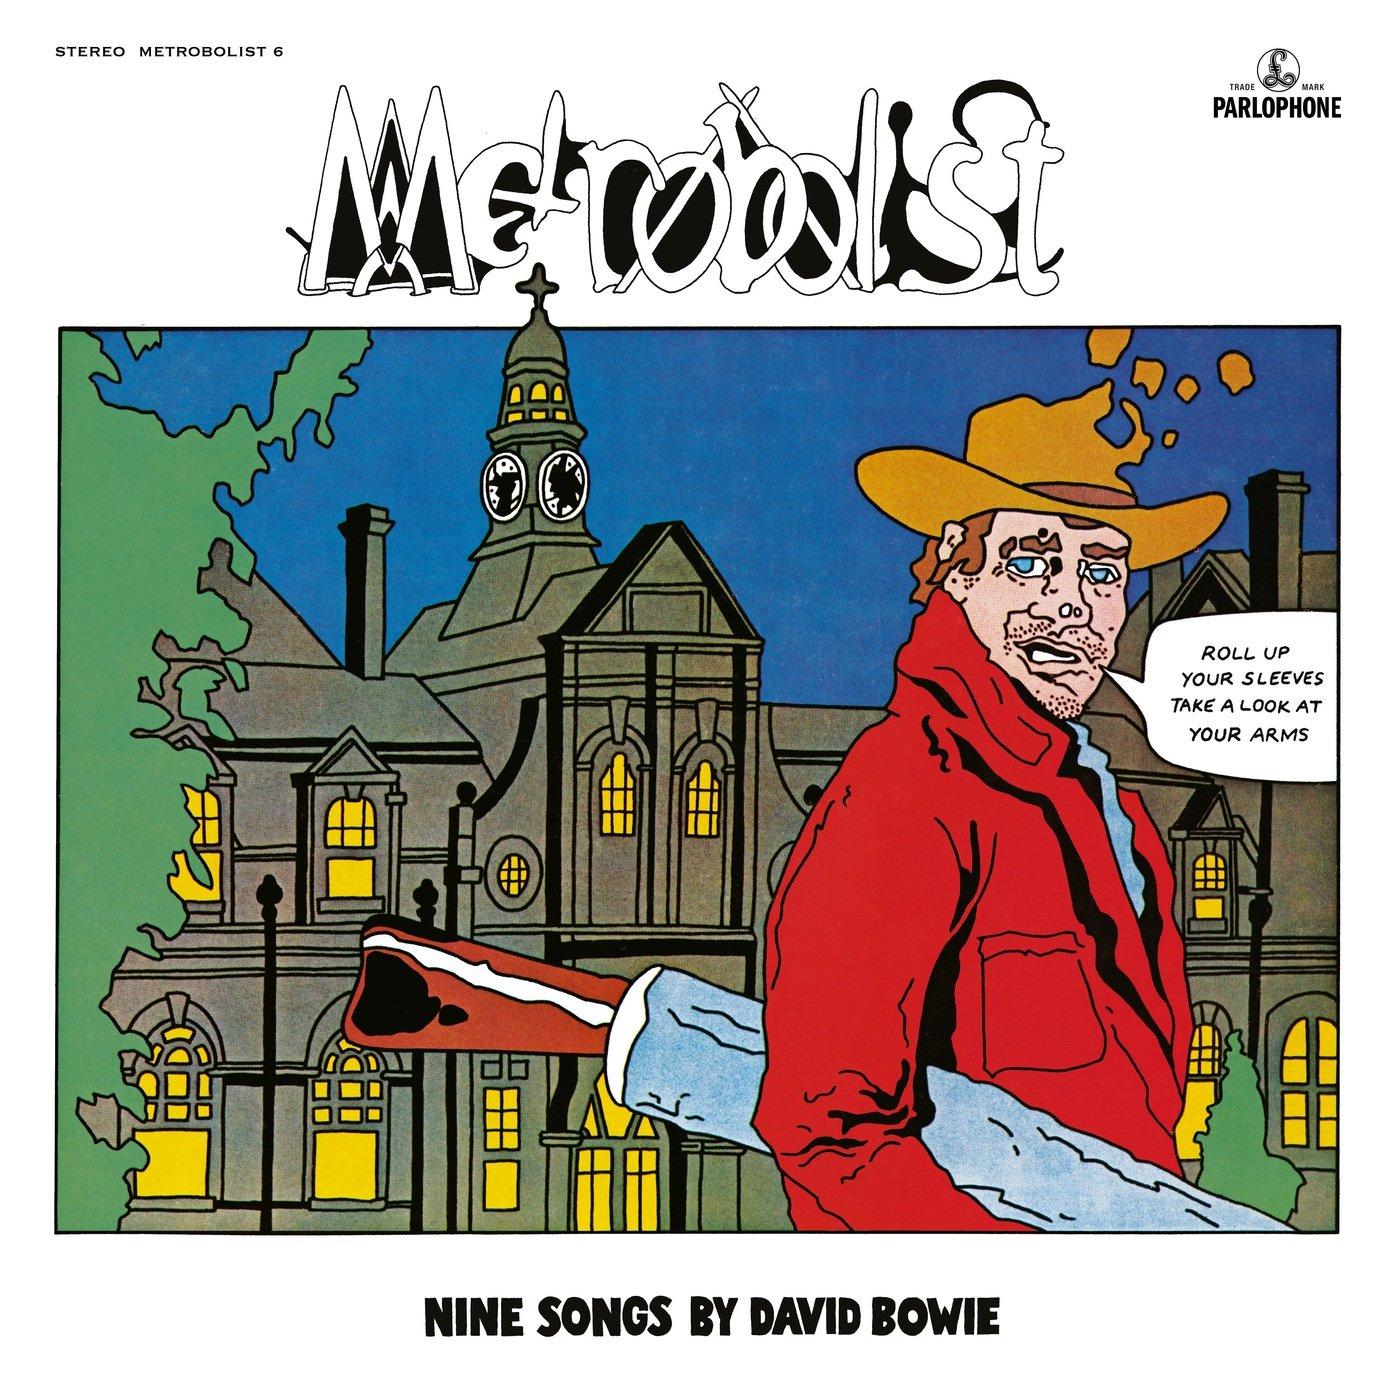 David Bowie - Metrobolist [Aka The Man Who Sold The World 2020 Mix] (2020) CD